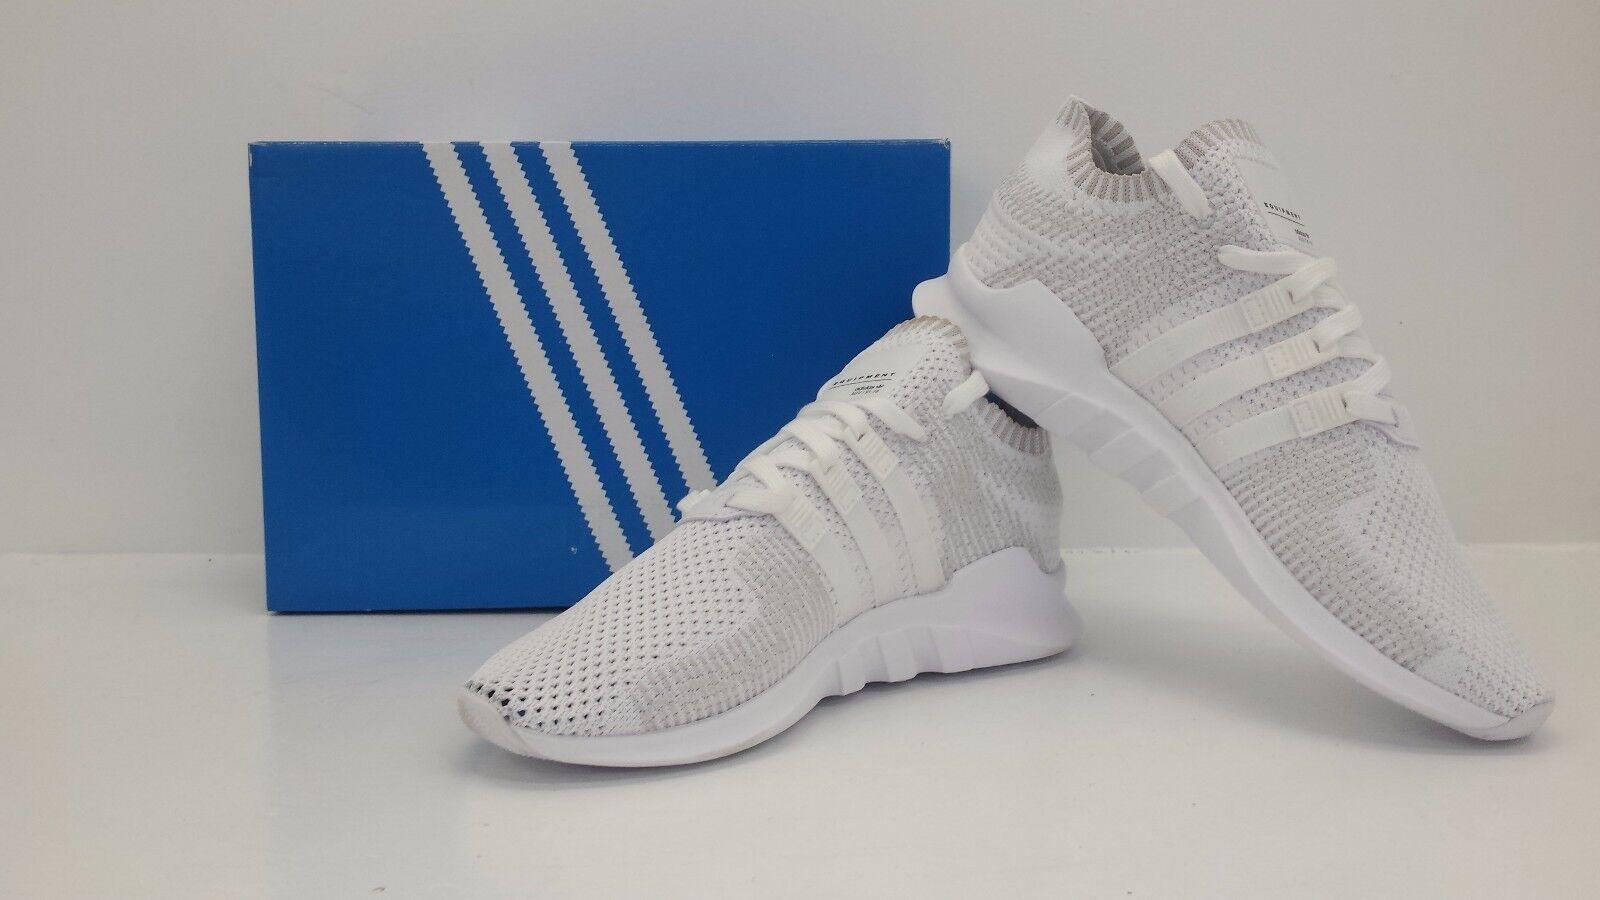 Adidas Originals hombres EQT de Apoyo de ADV - PK primeknit Blanco by9391 - ADV BRAND NEW 30c708